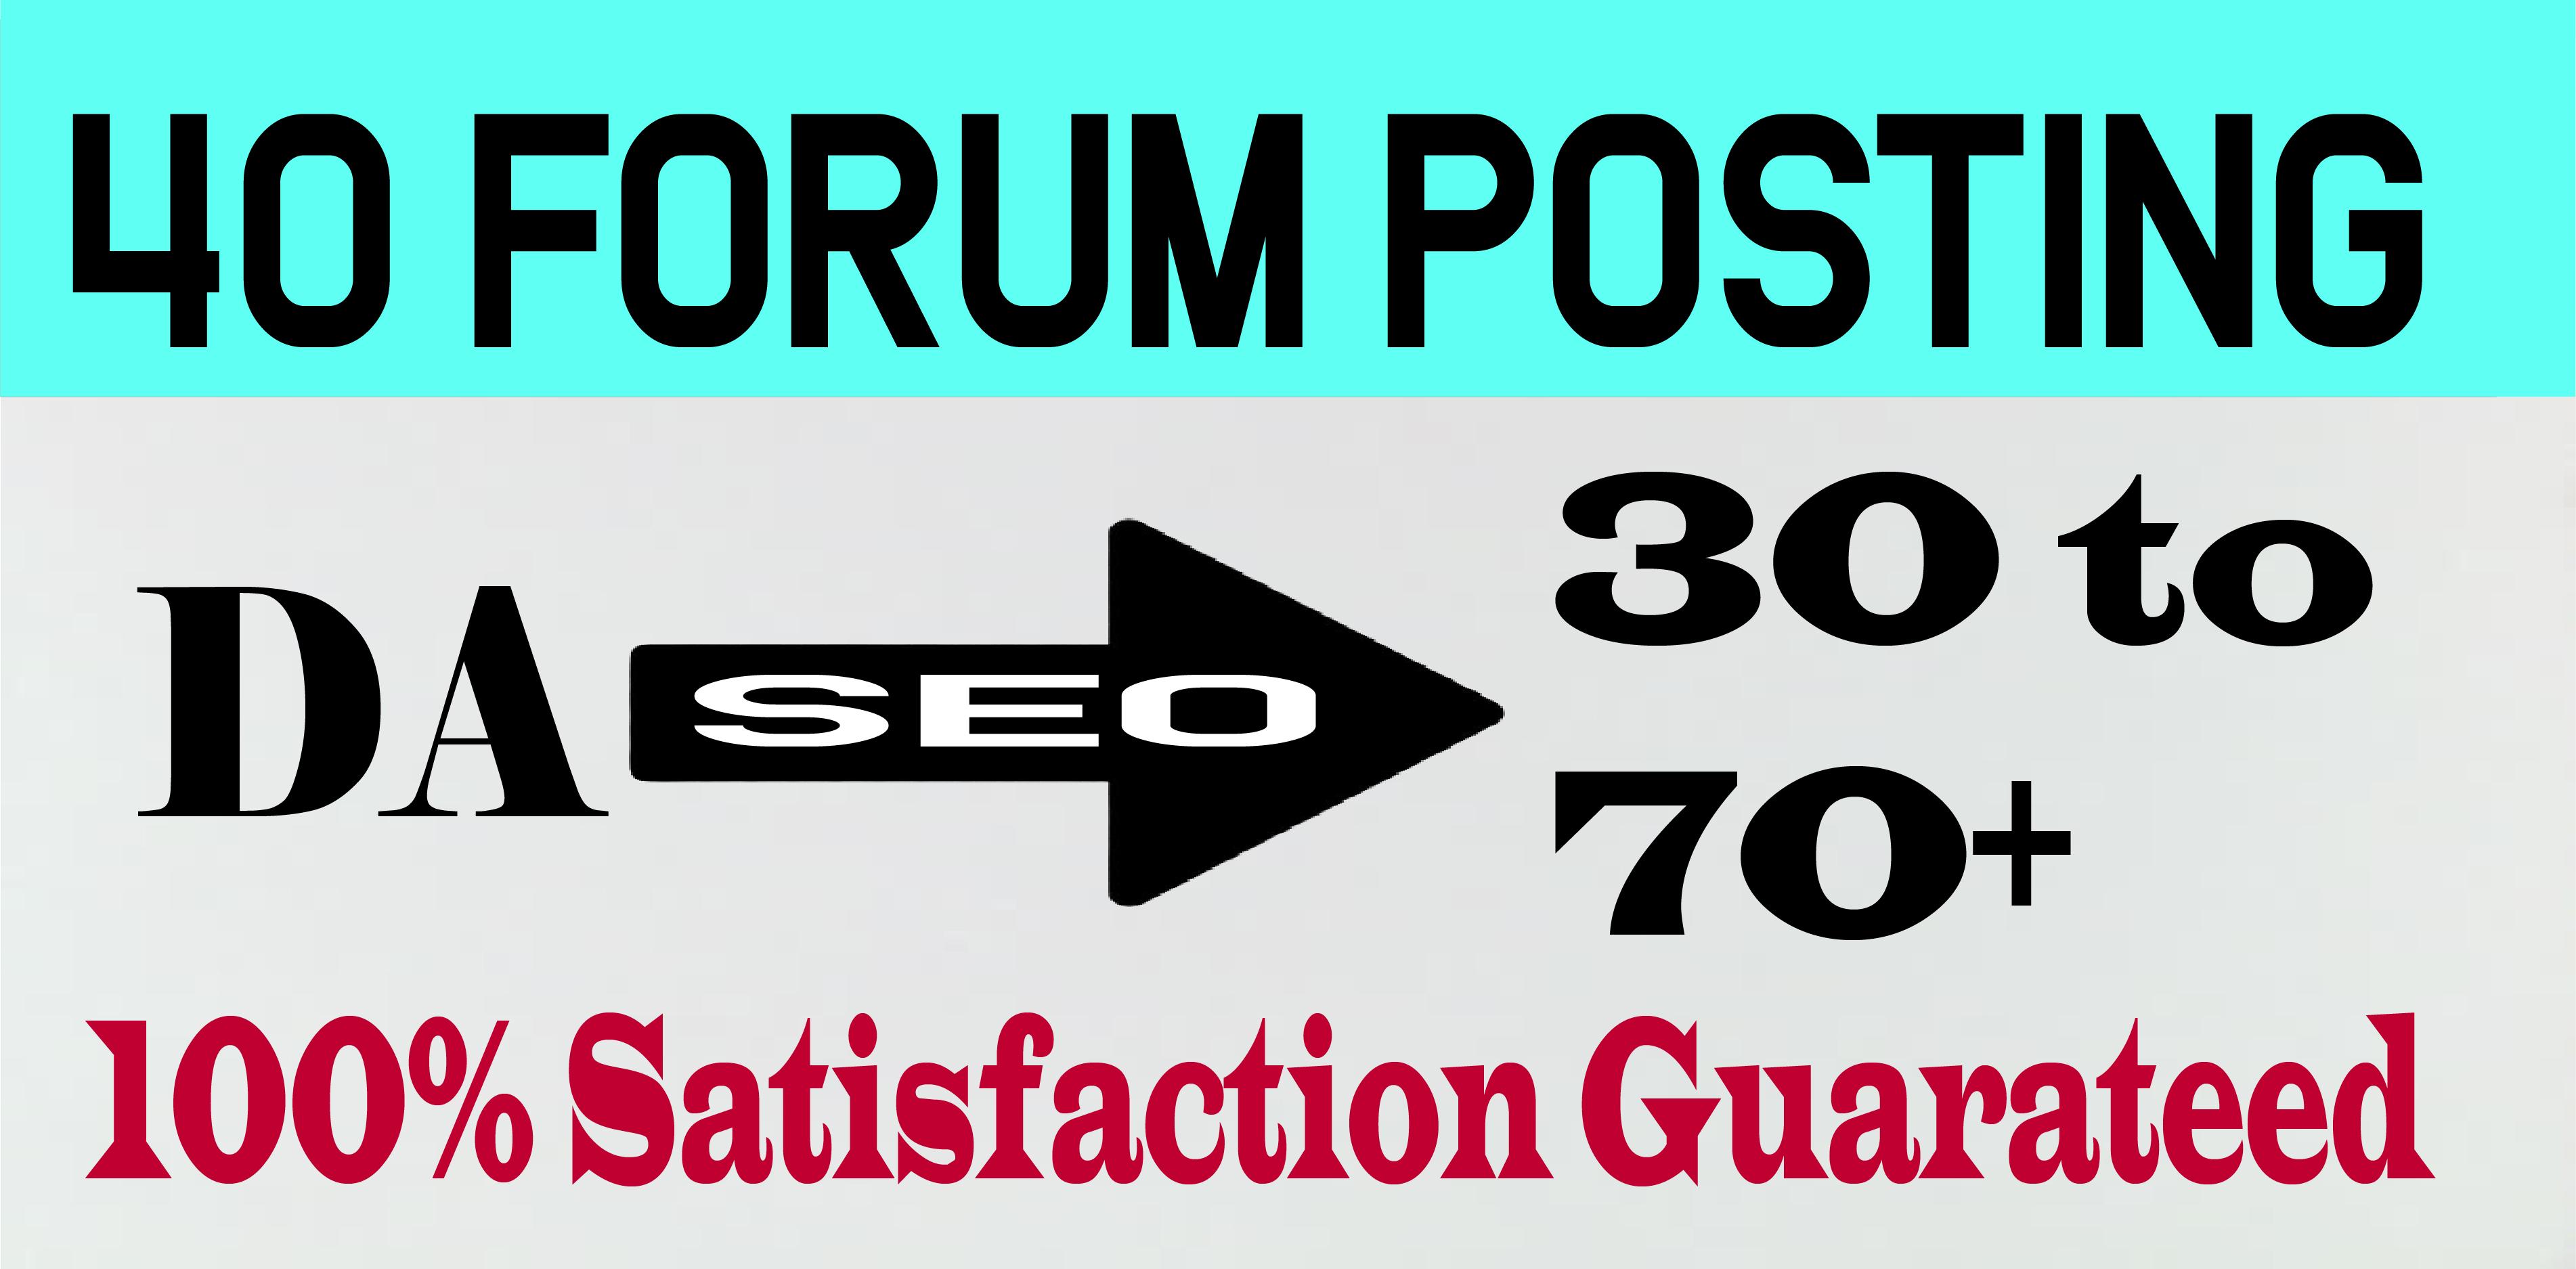 Make Forum Comment/Posting Backlinks High DA40+